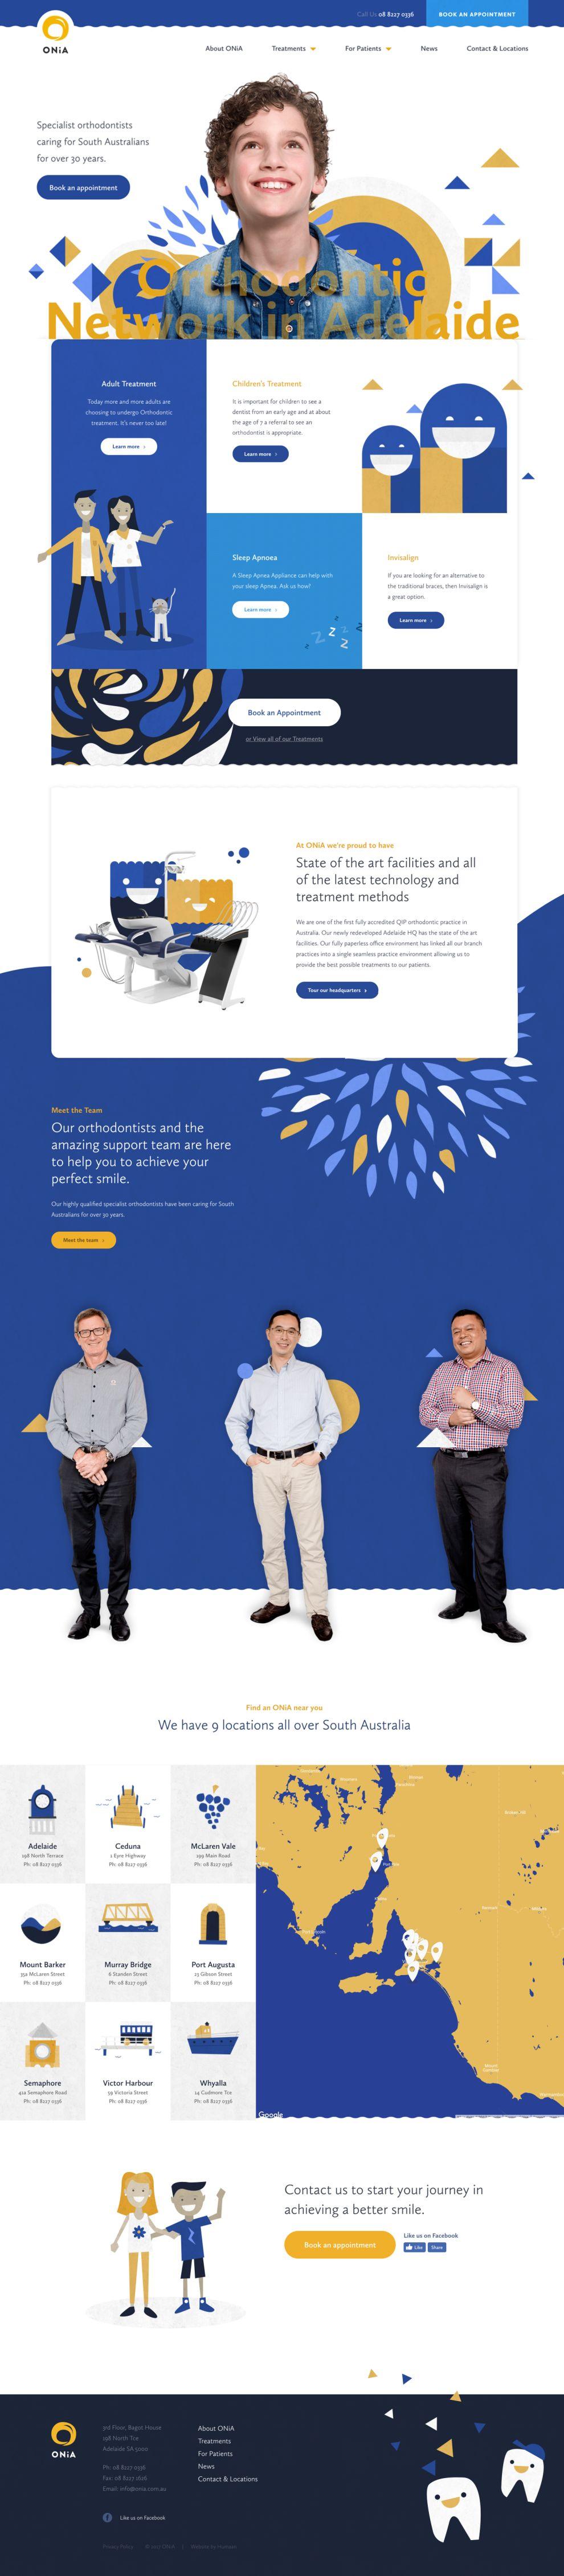 Orthodontic Network in Adelaide Amazing Homepage